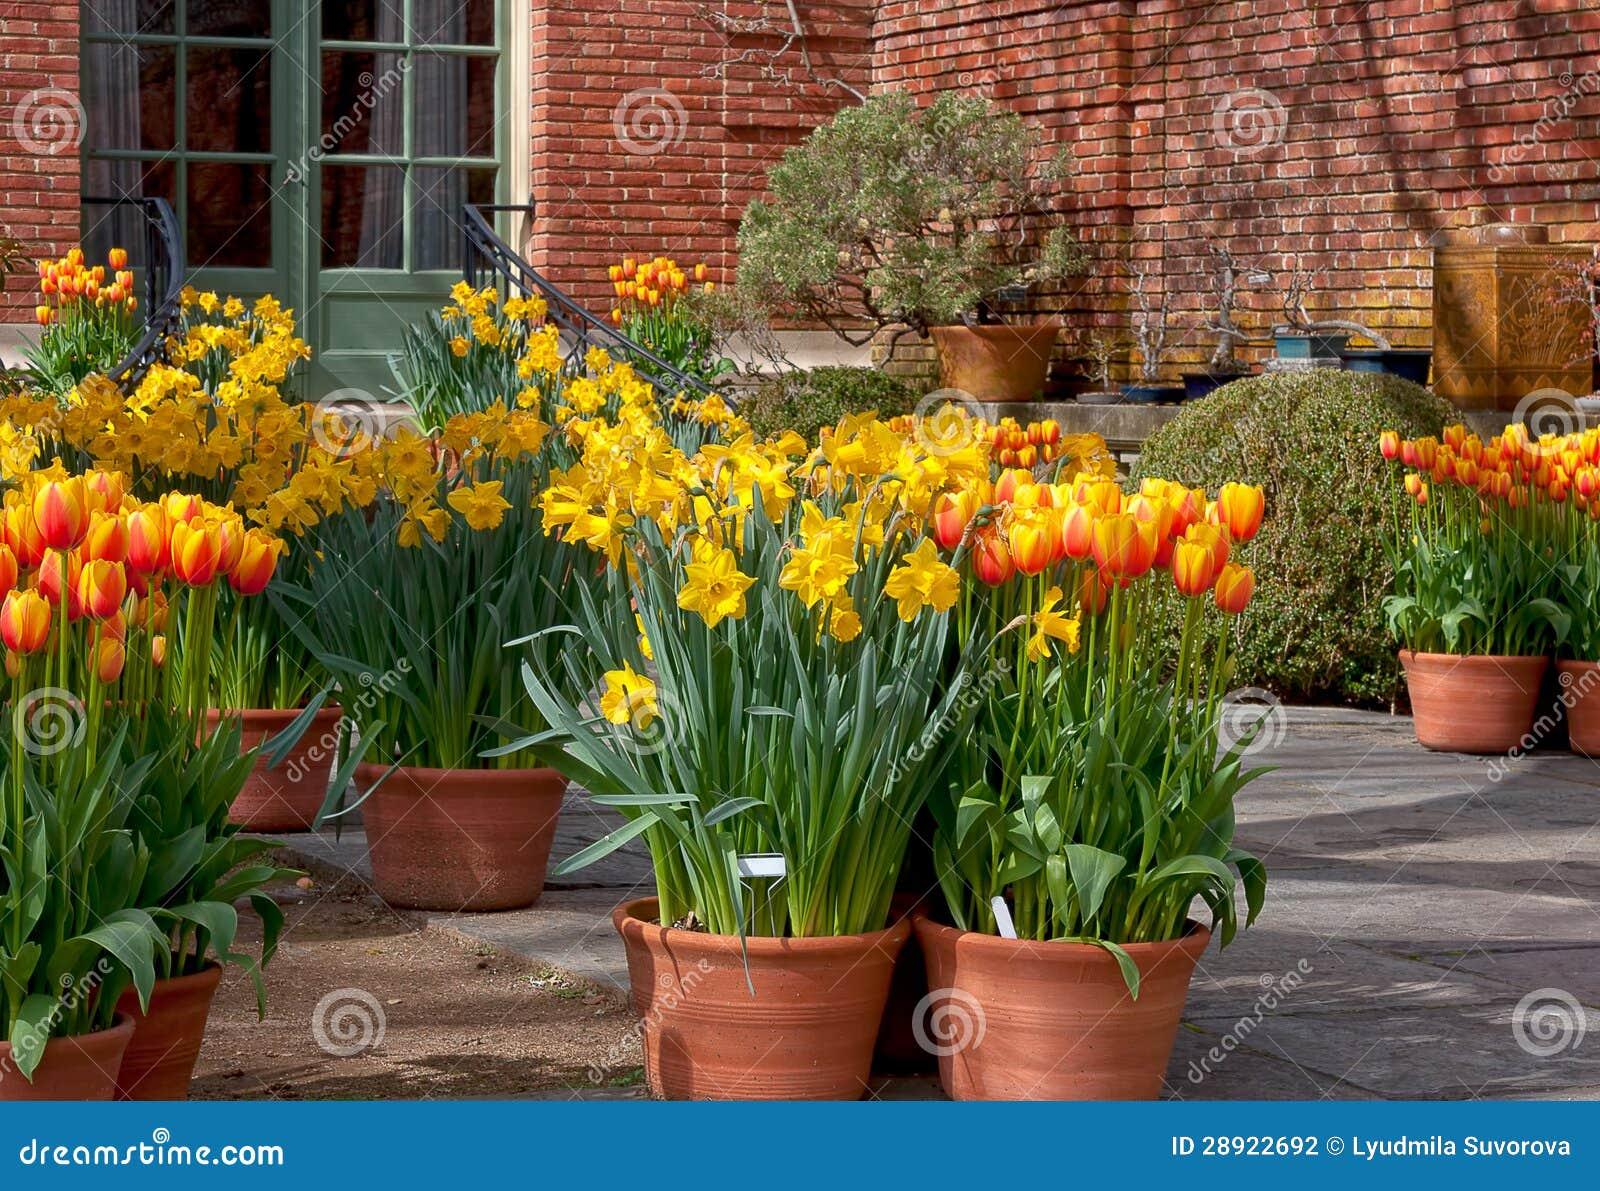 Spring flower pots stock photo Image of gardening green